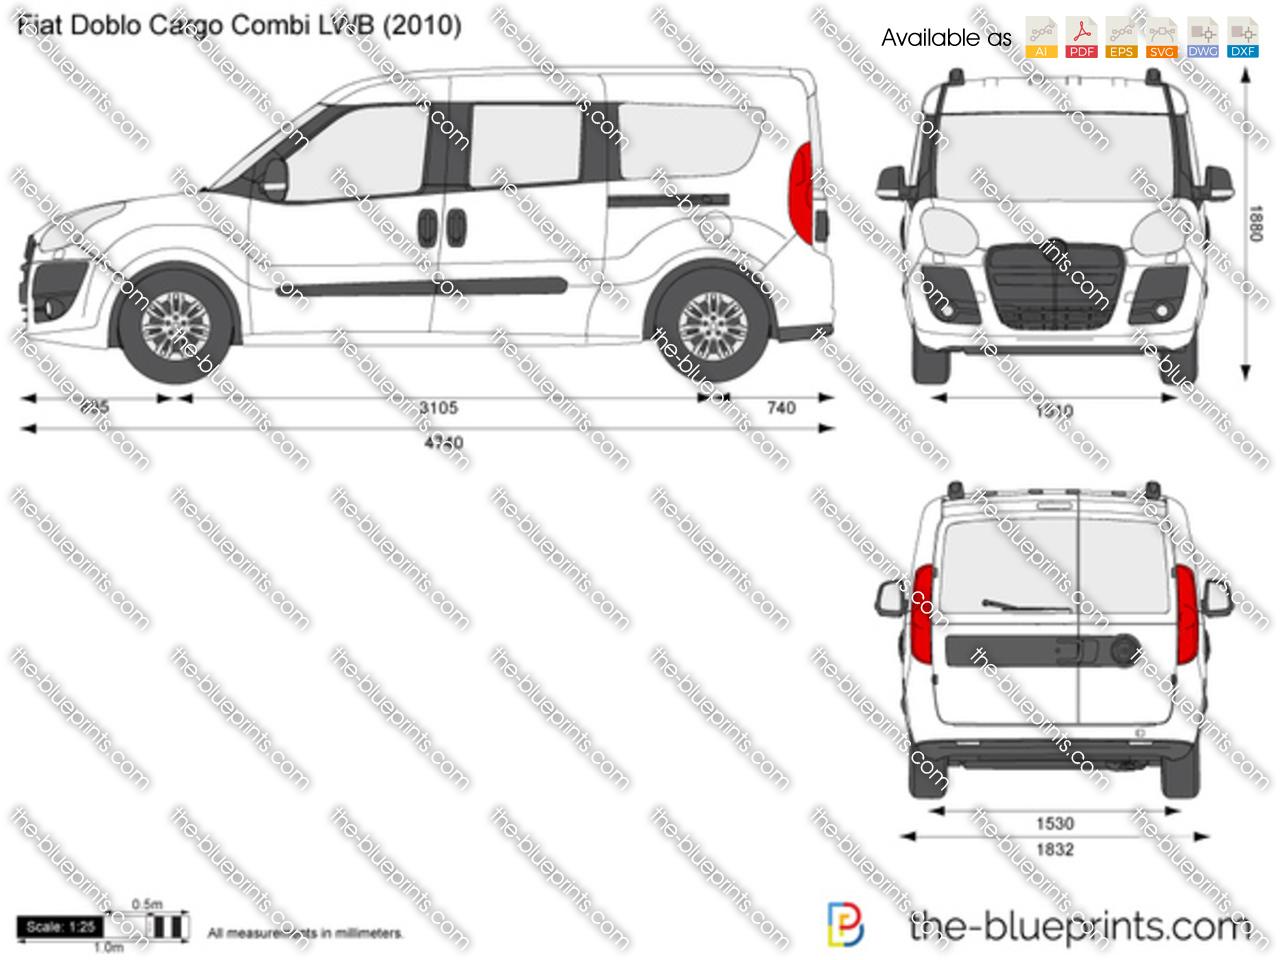 Fiat Doblo Cargo Combi LWB 2011